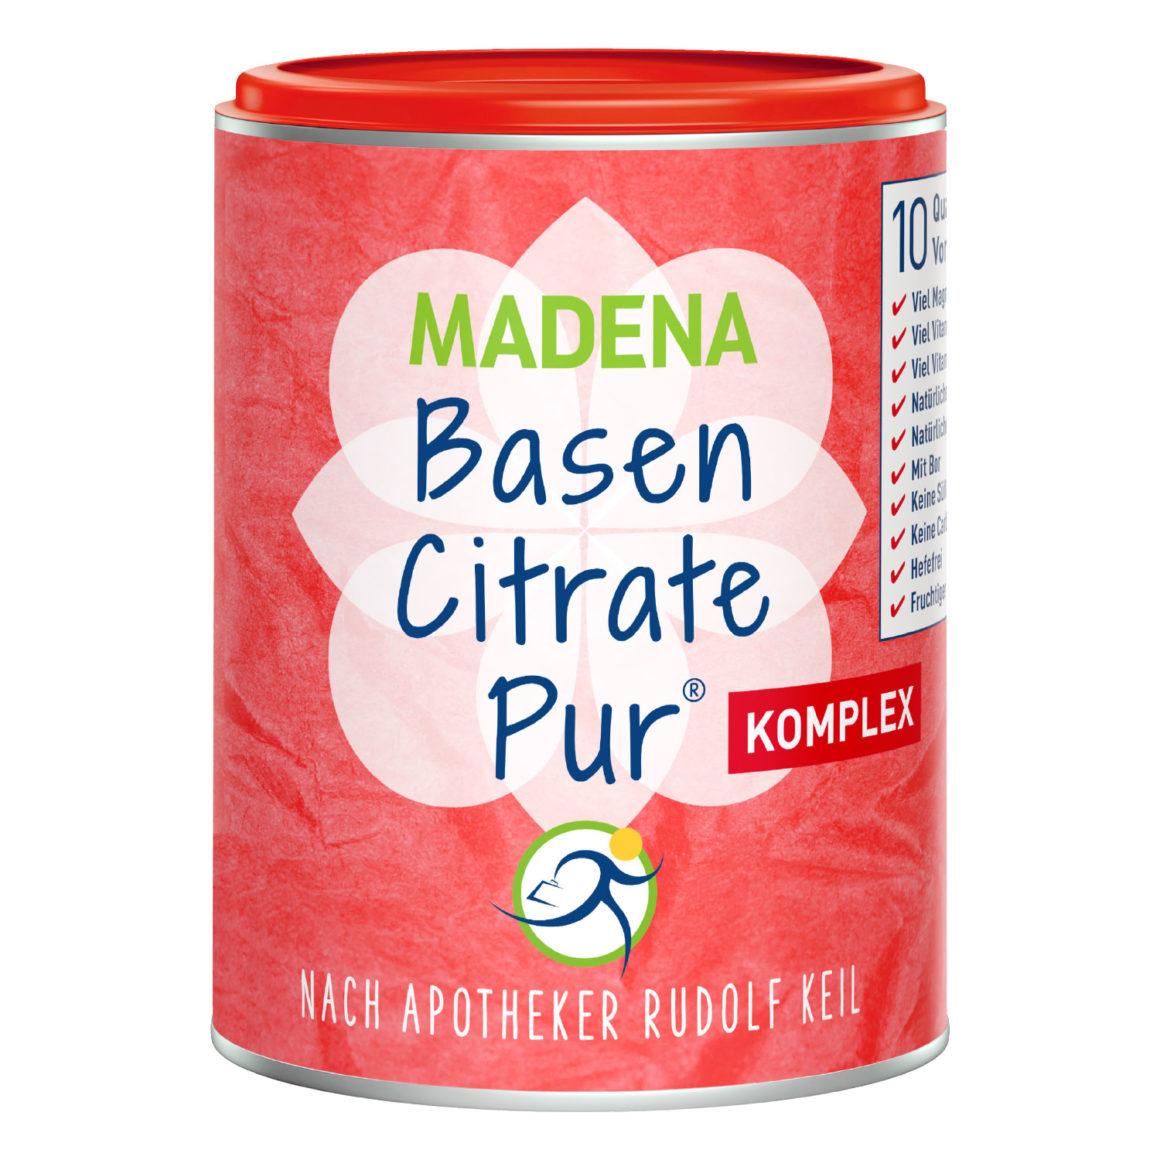 Madena Basen Citrate Pur Komplex